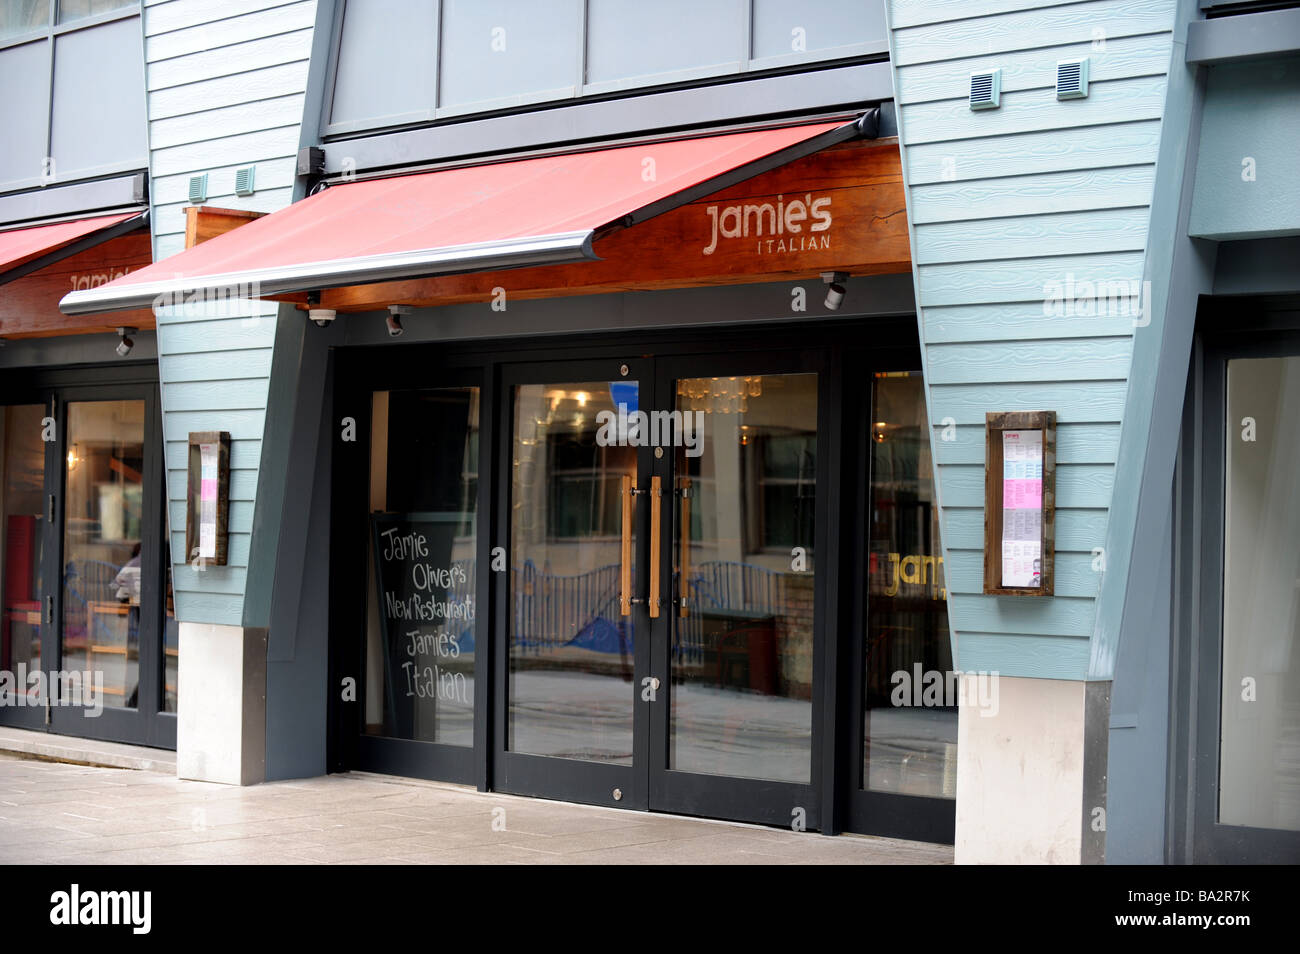 Jamie oliver's new italian restaurant in brighton - Stock Image